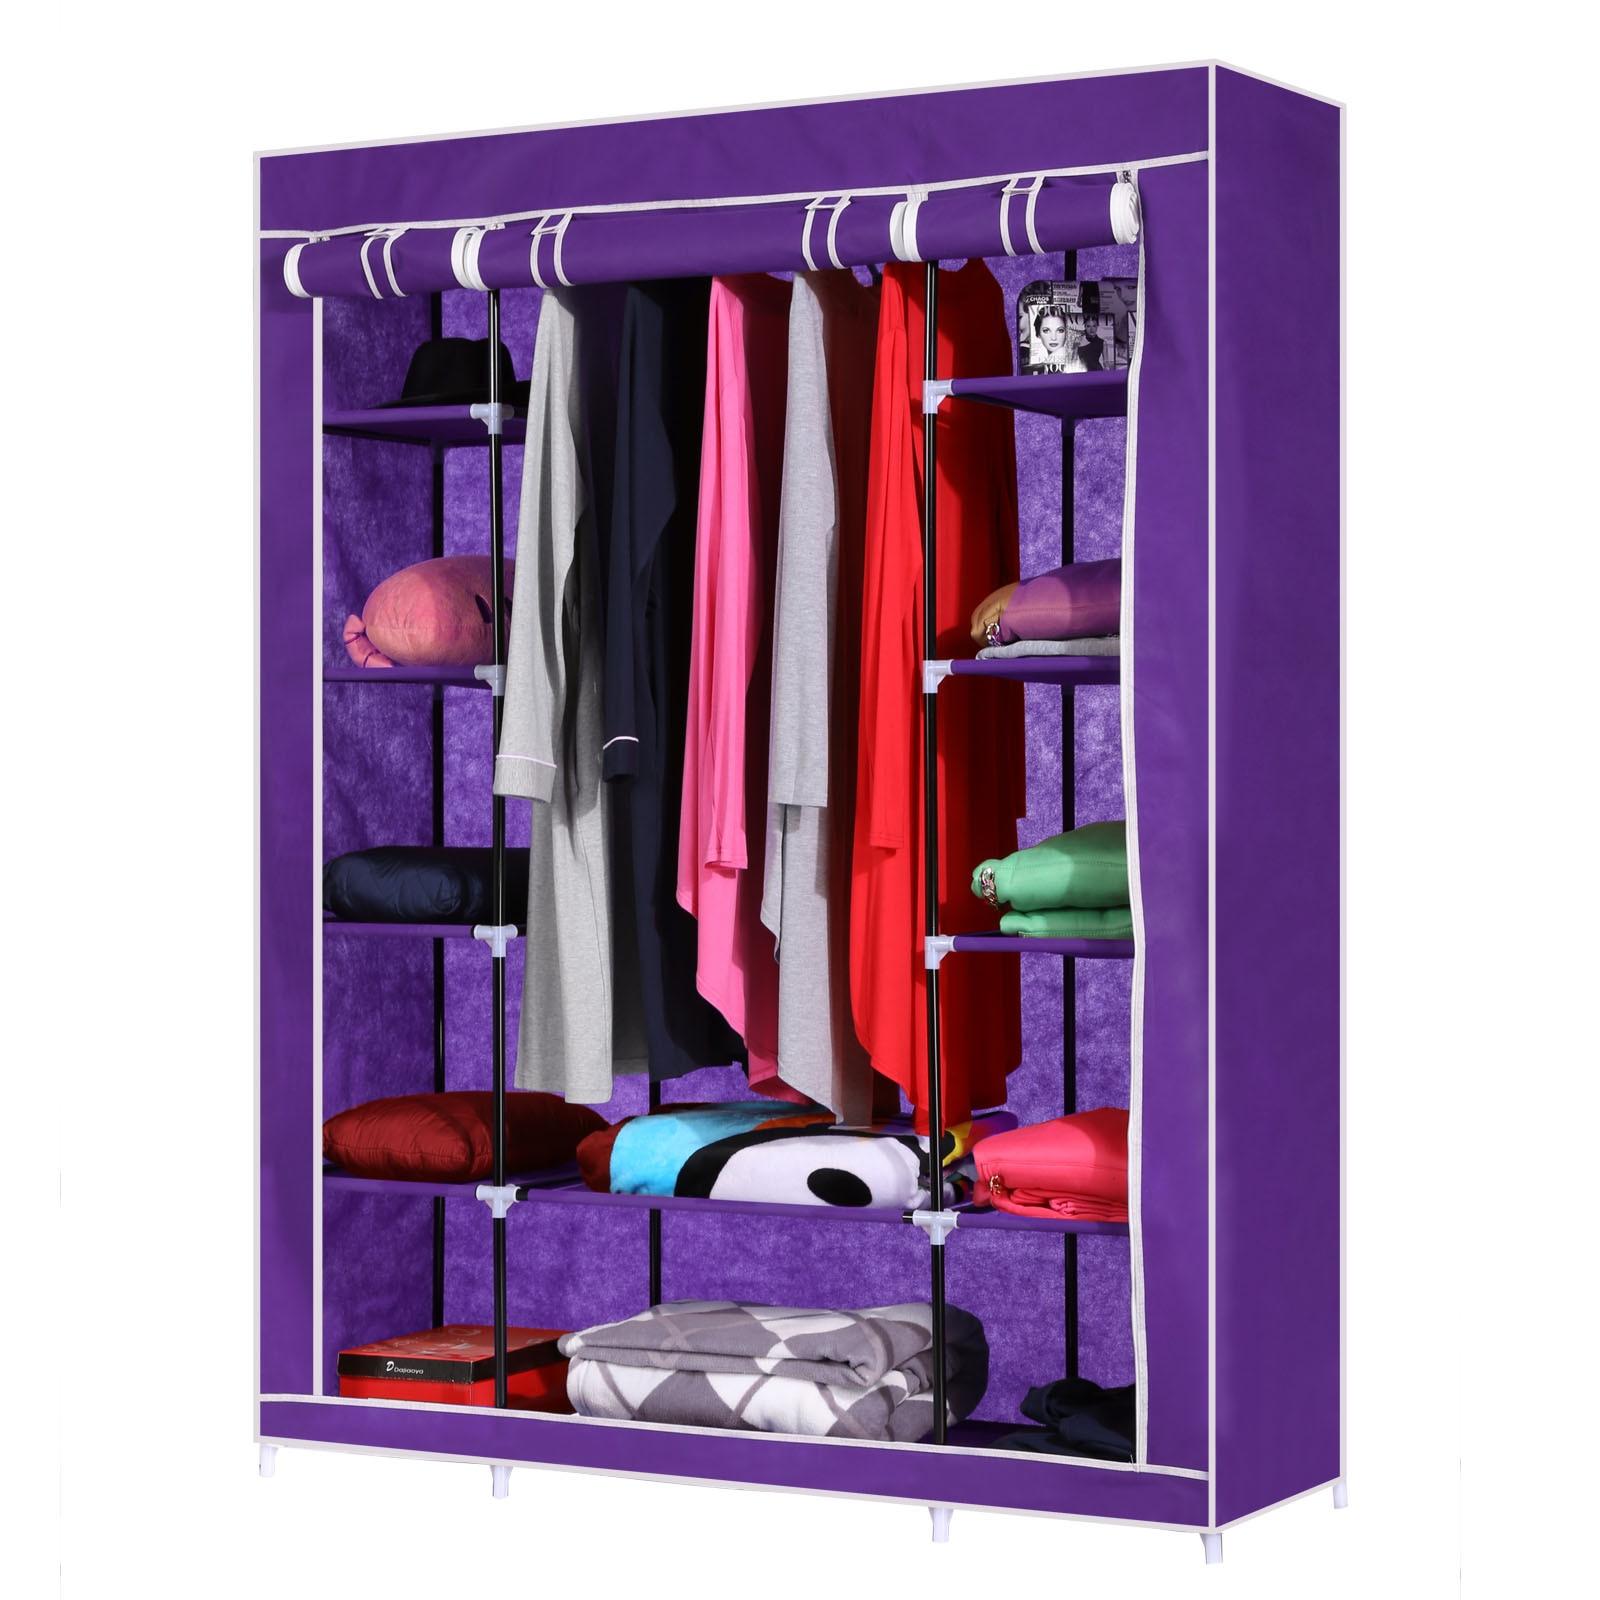 Homdox Bedroom Furniture Folding Cloth Wardrobe Portable Clothes Closet  Cloth Cabinet Large Capacity Wardrobes In Wardrobes From Furniture On  Aliexpress.com ...